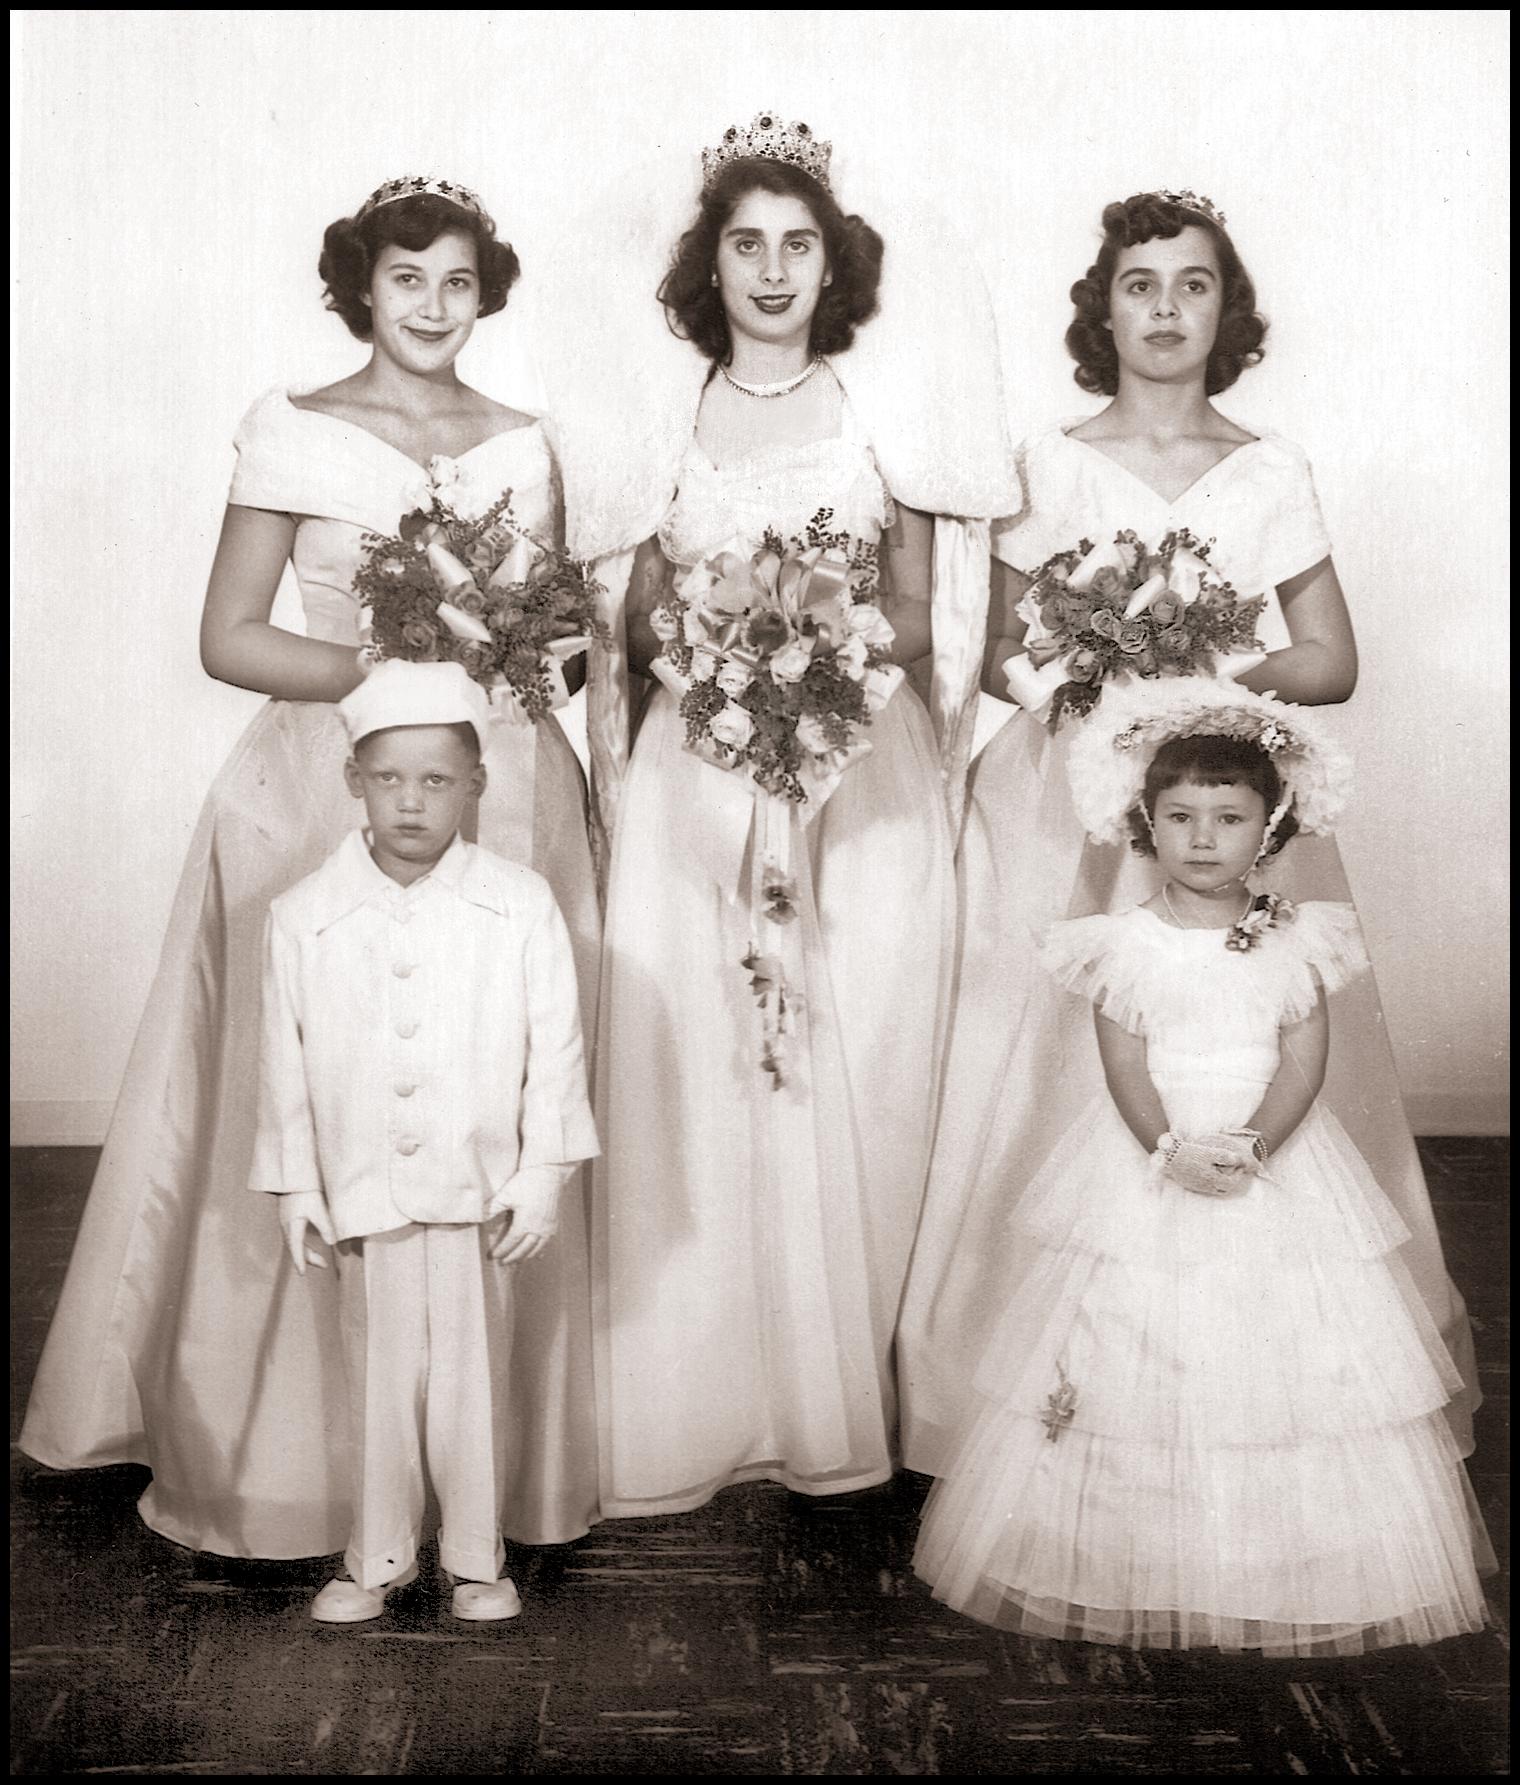 1951 Festival Queen -   Arlene Silva Abbott     Sidemaids -  Evelyn Bettencourt Patton & Donna Bettencourt Shoults